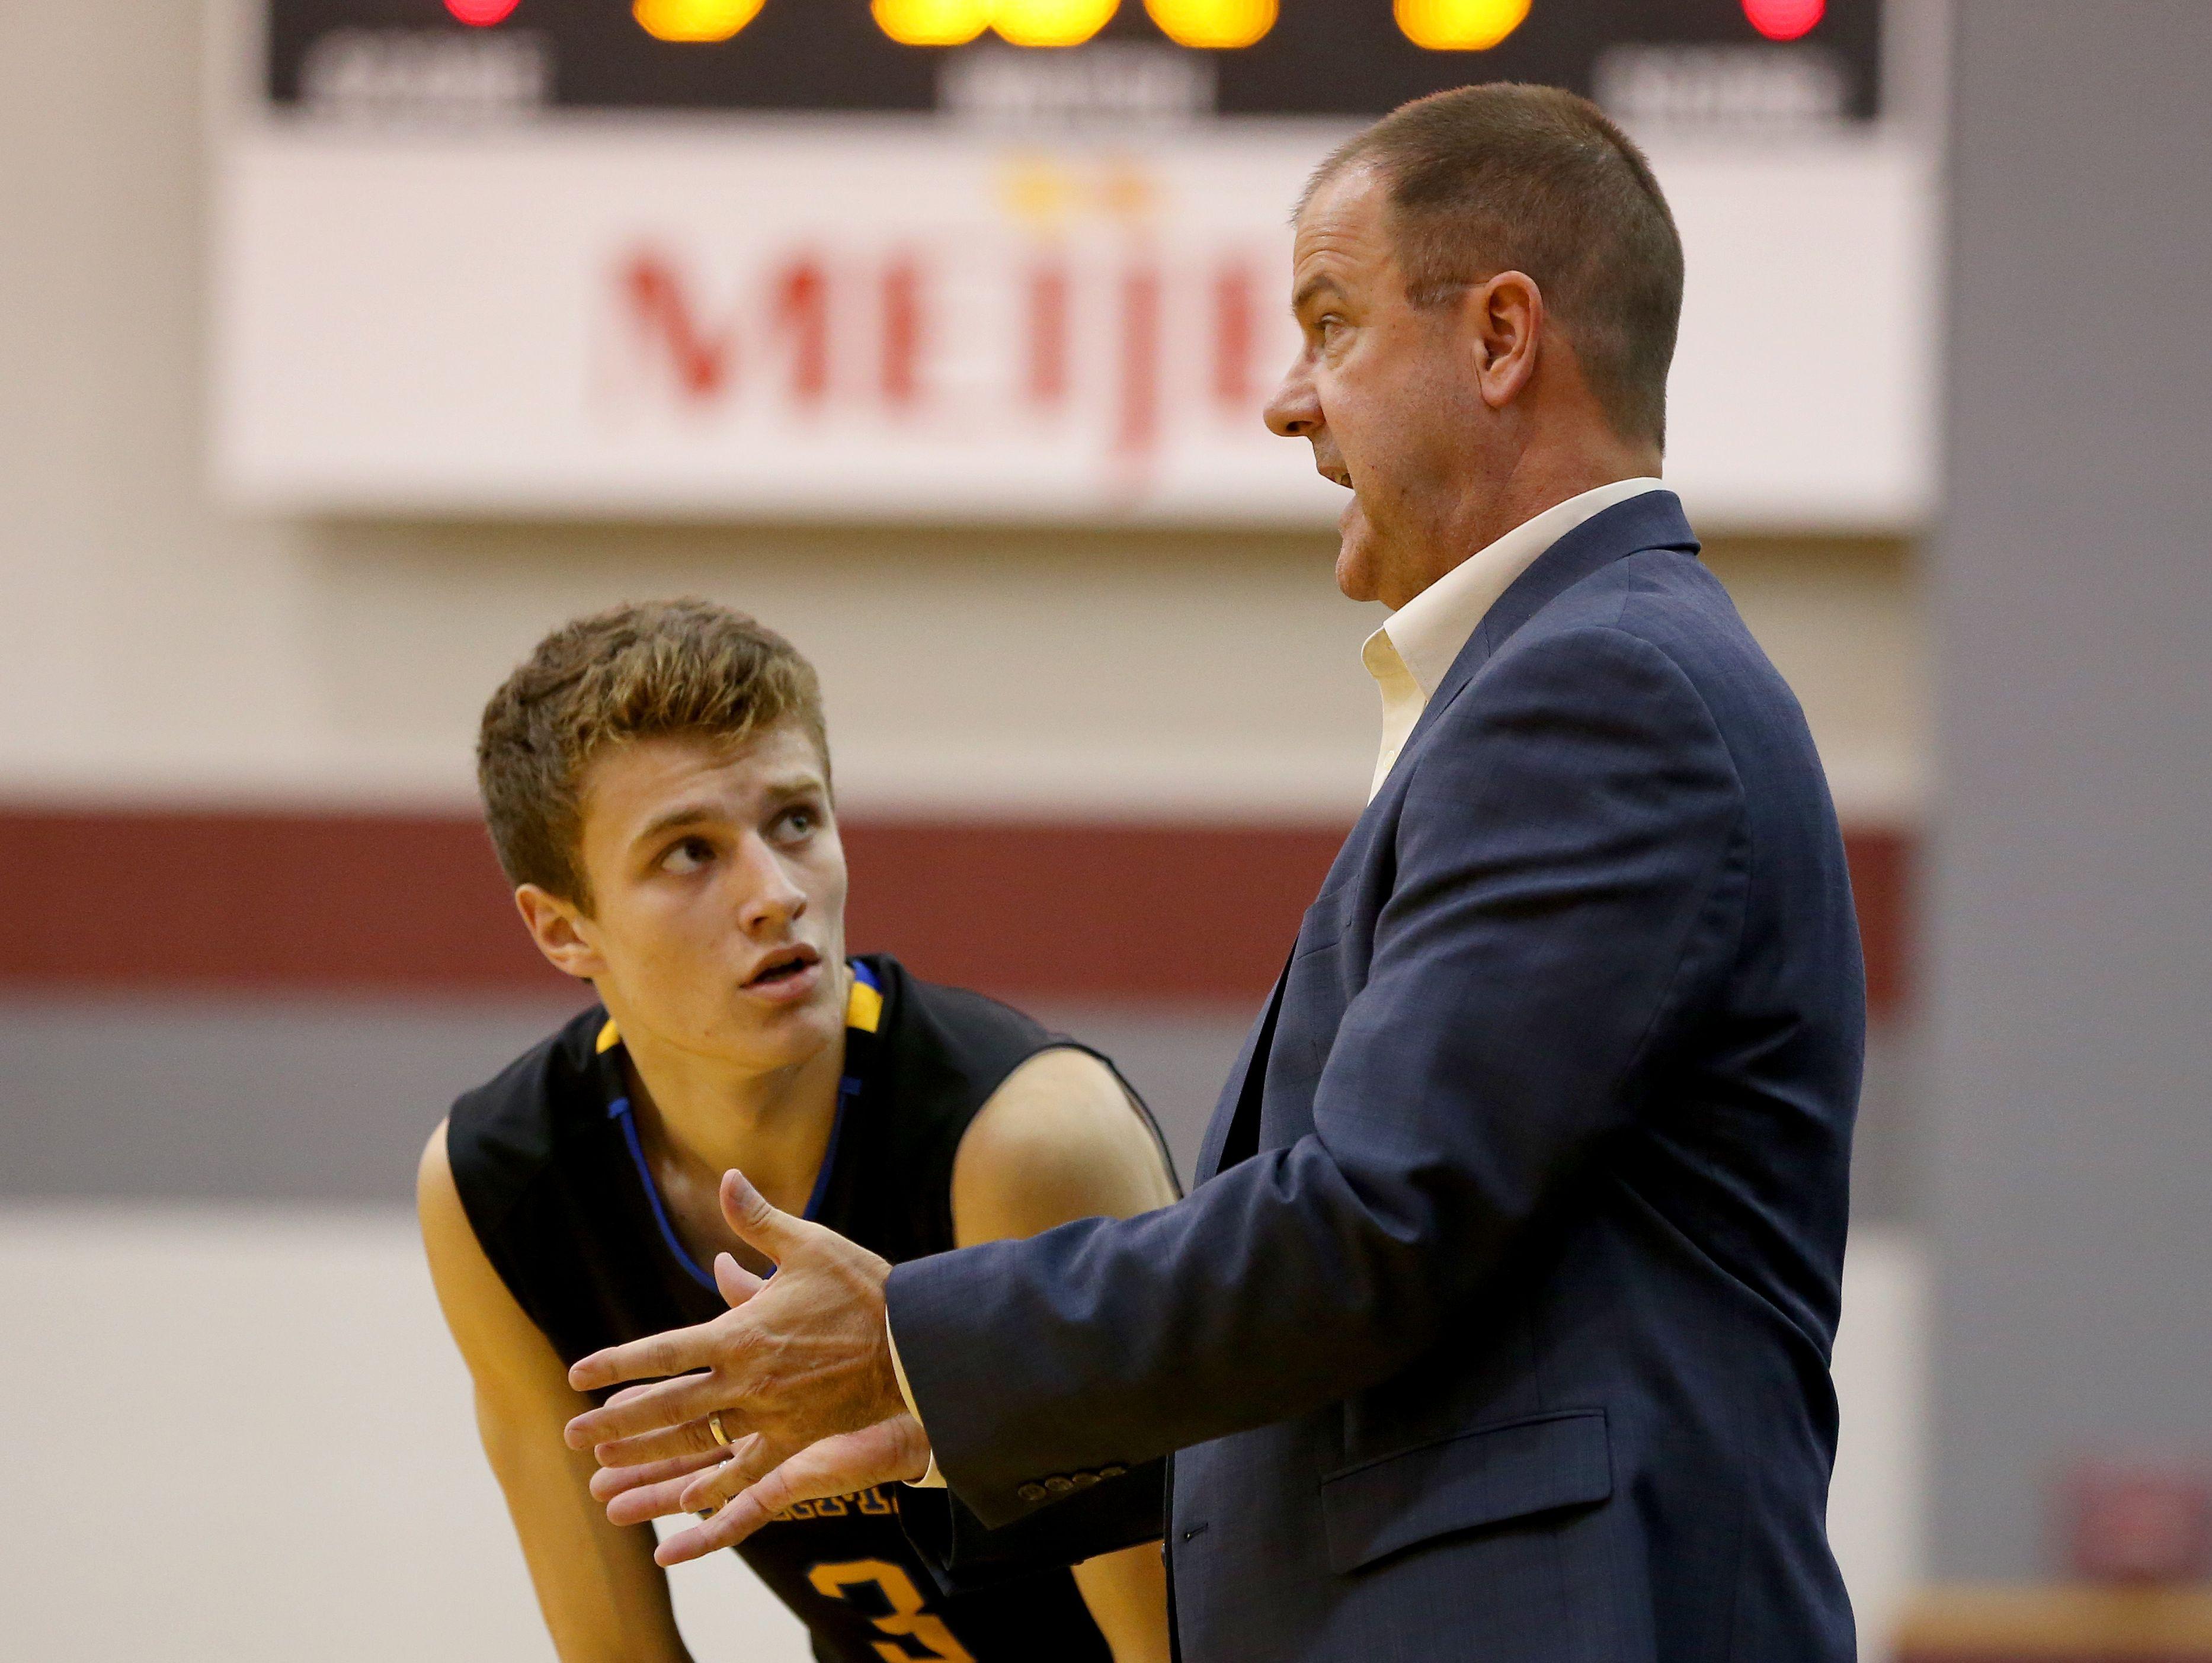 Carmel coach Scott Heady talks with Carmel's Cole Jenkins (3) on Dec. 4, 2015.